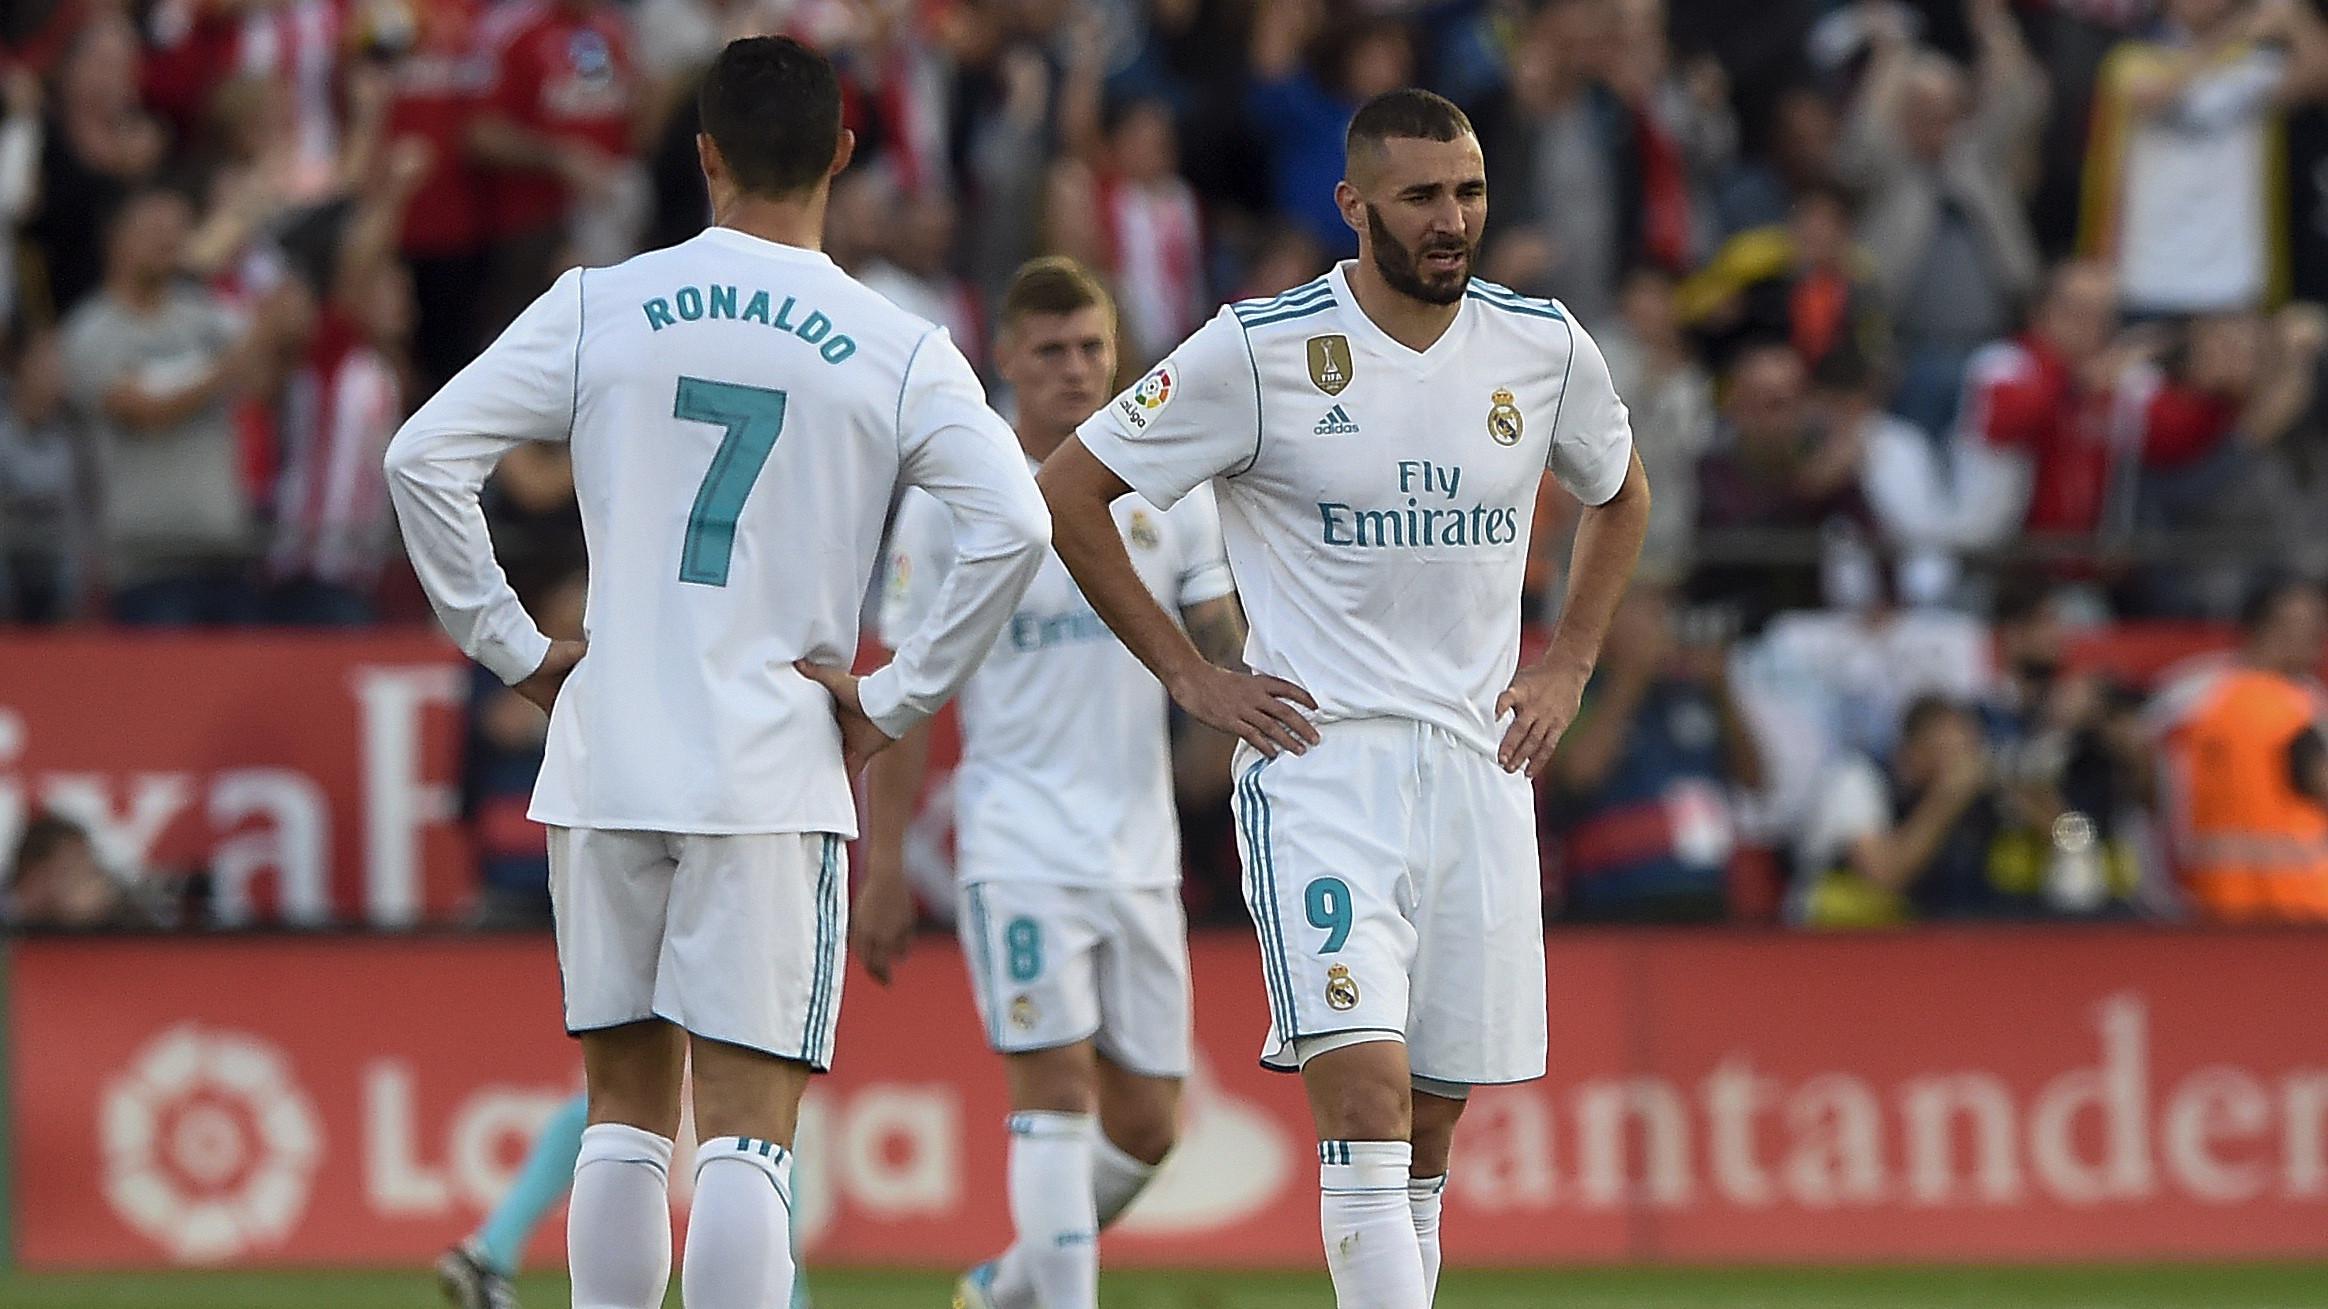 Kebencian terhadap Real Madrid juga berhubungan dengan diktator Spanyol Jenderal Franco selama tahun 1930-an. (AFP/Josep Lago)